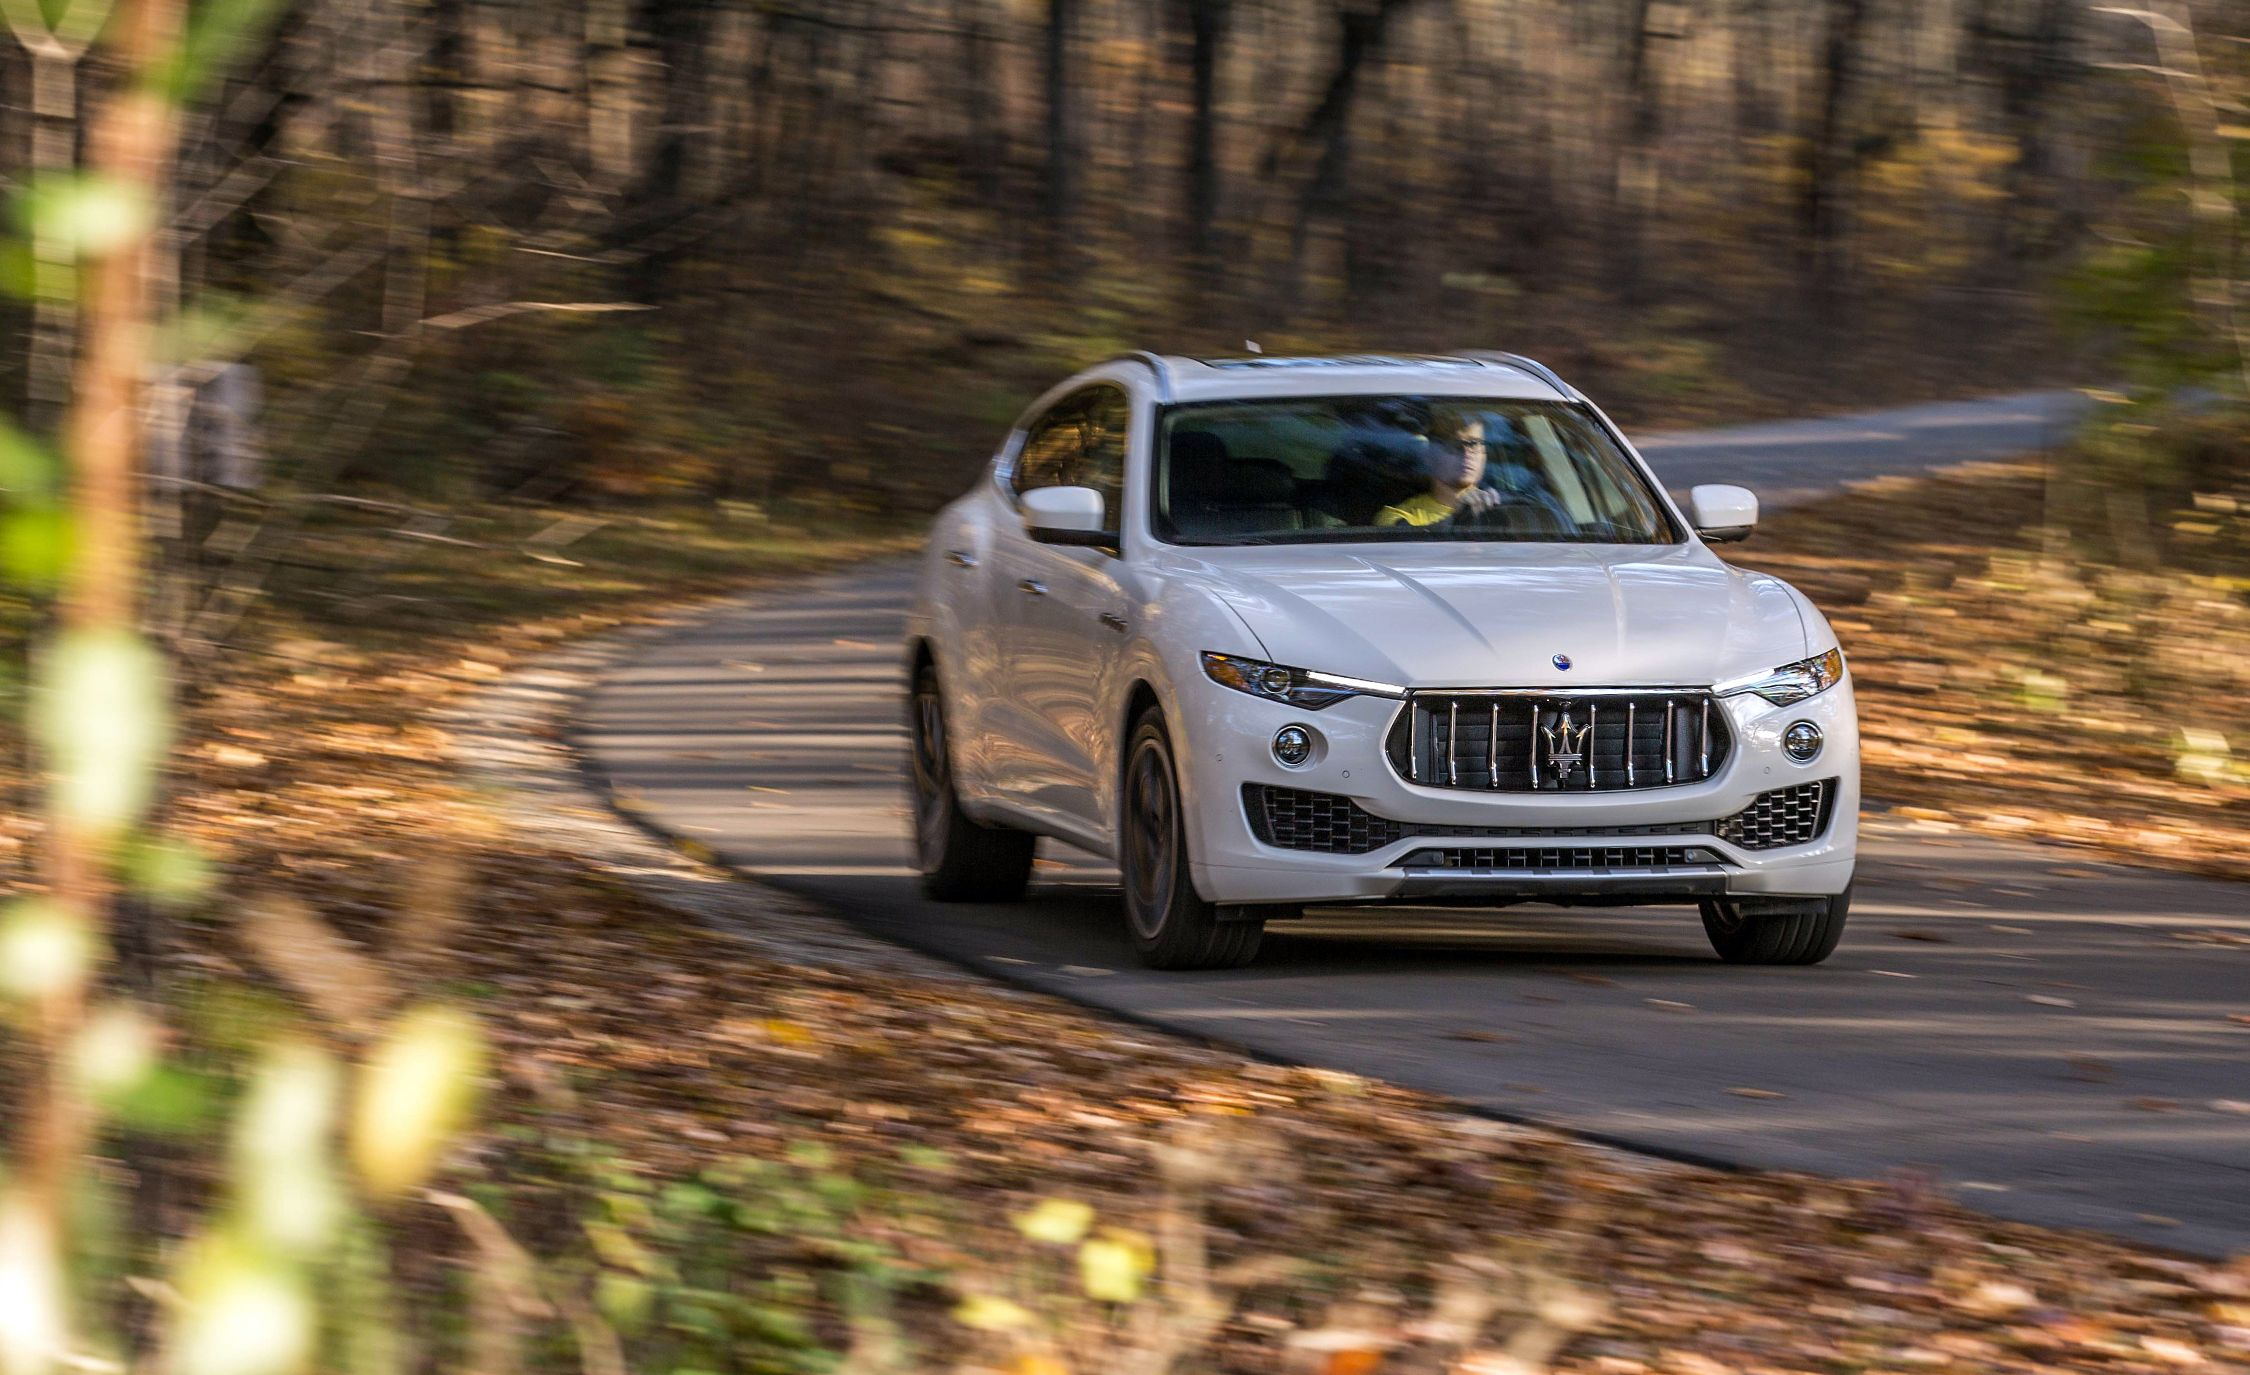 Maserati Levante Reviews | Maserati Levante Price, Photos, and Specs